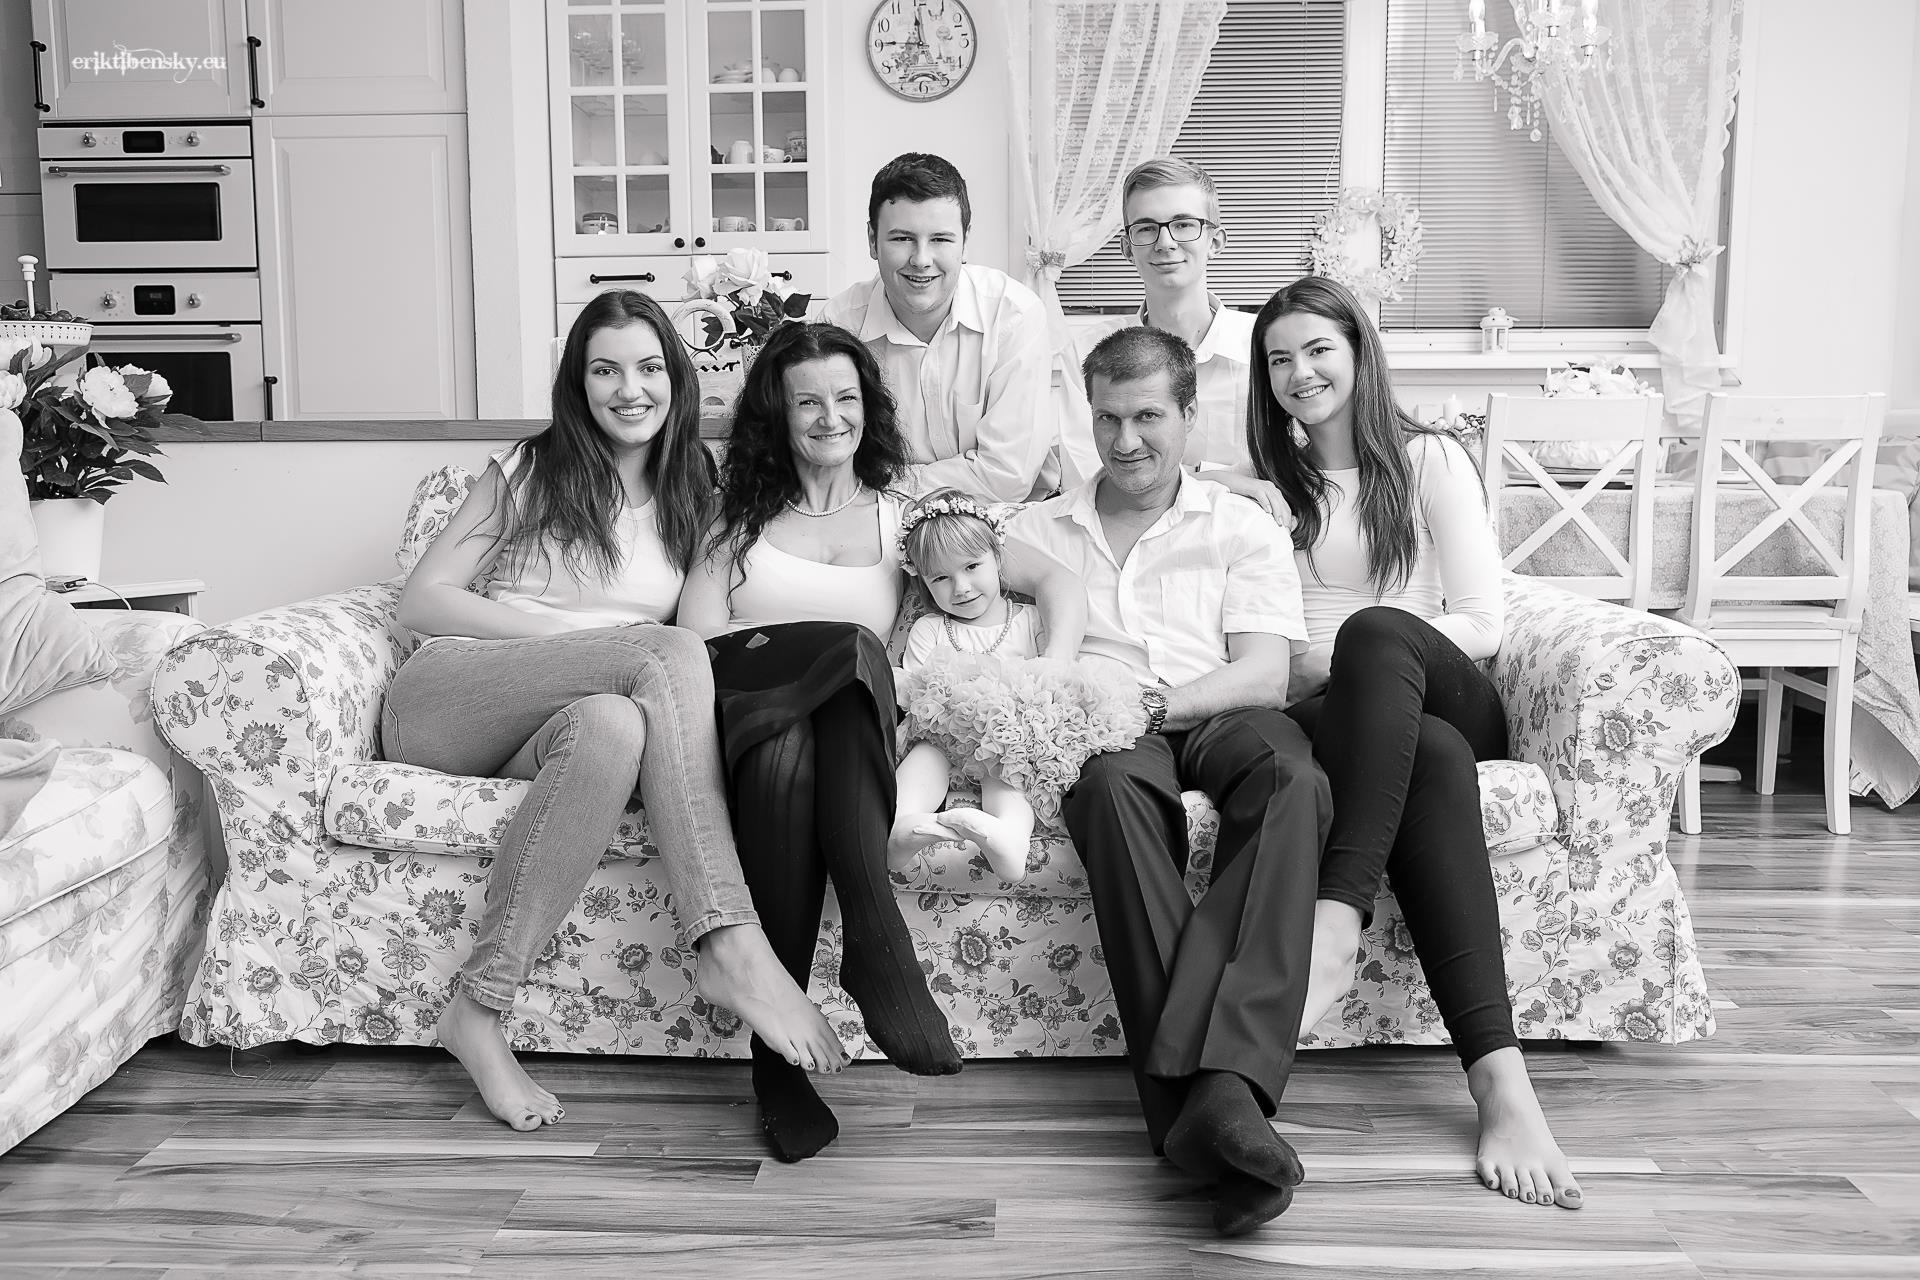 eriktibensky-eu-fotograf-home-photo-family-rodina-kids-deti-1027